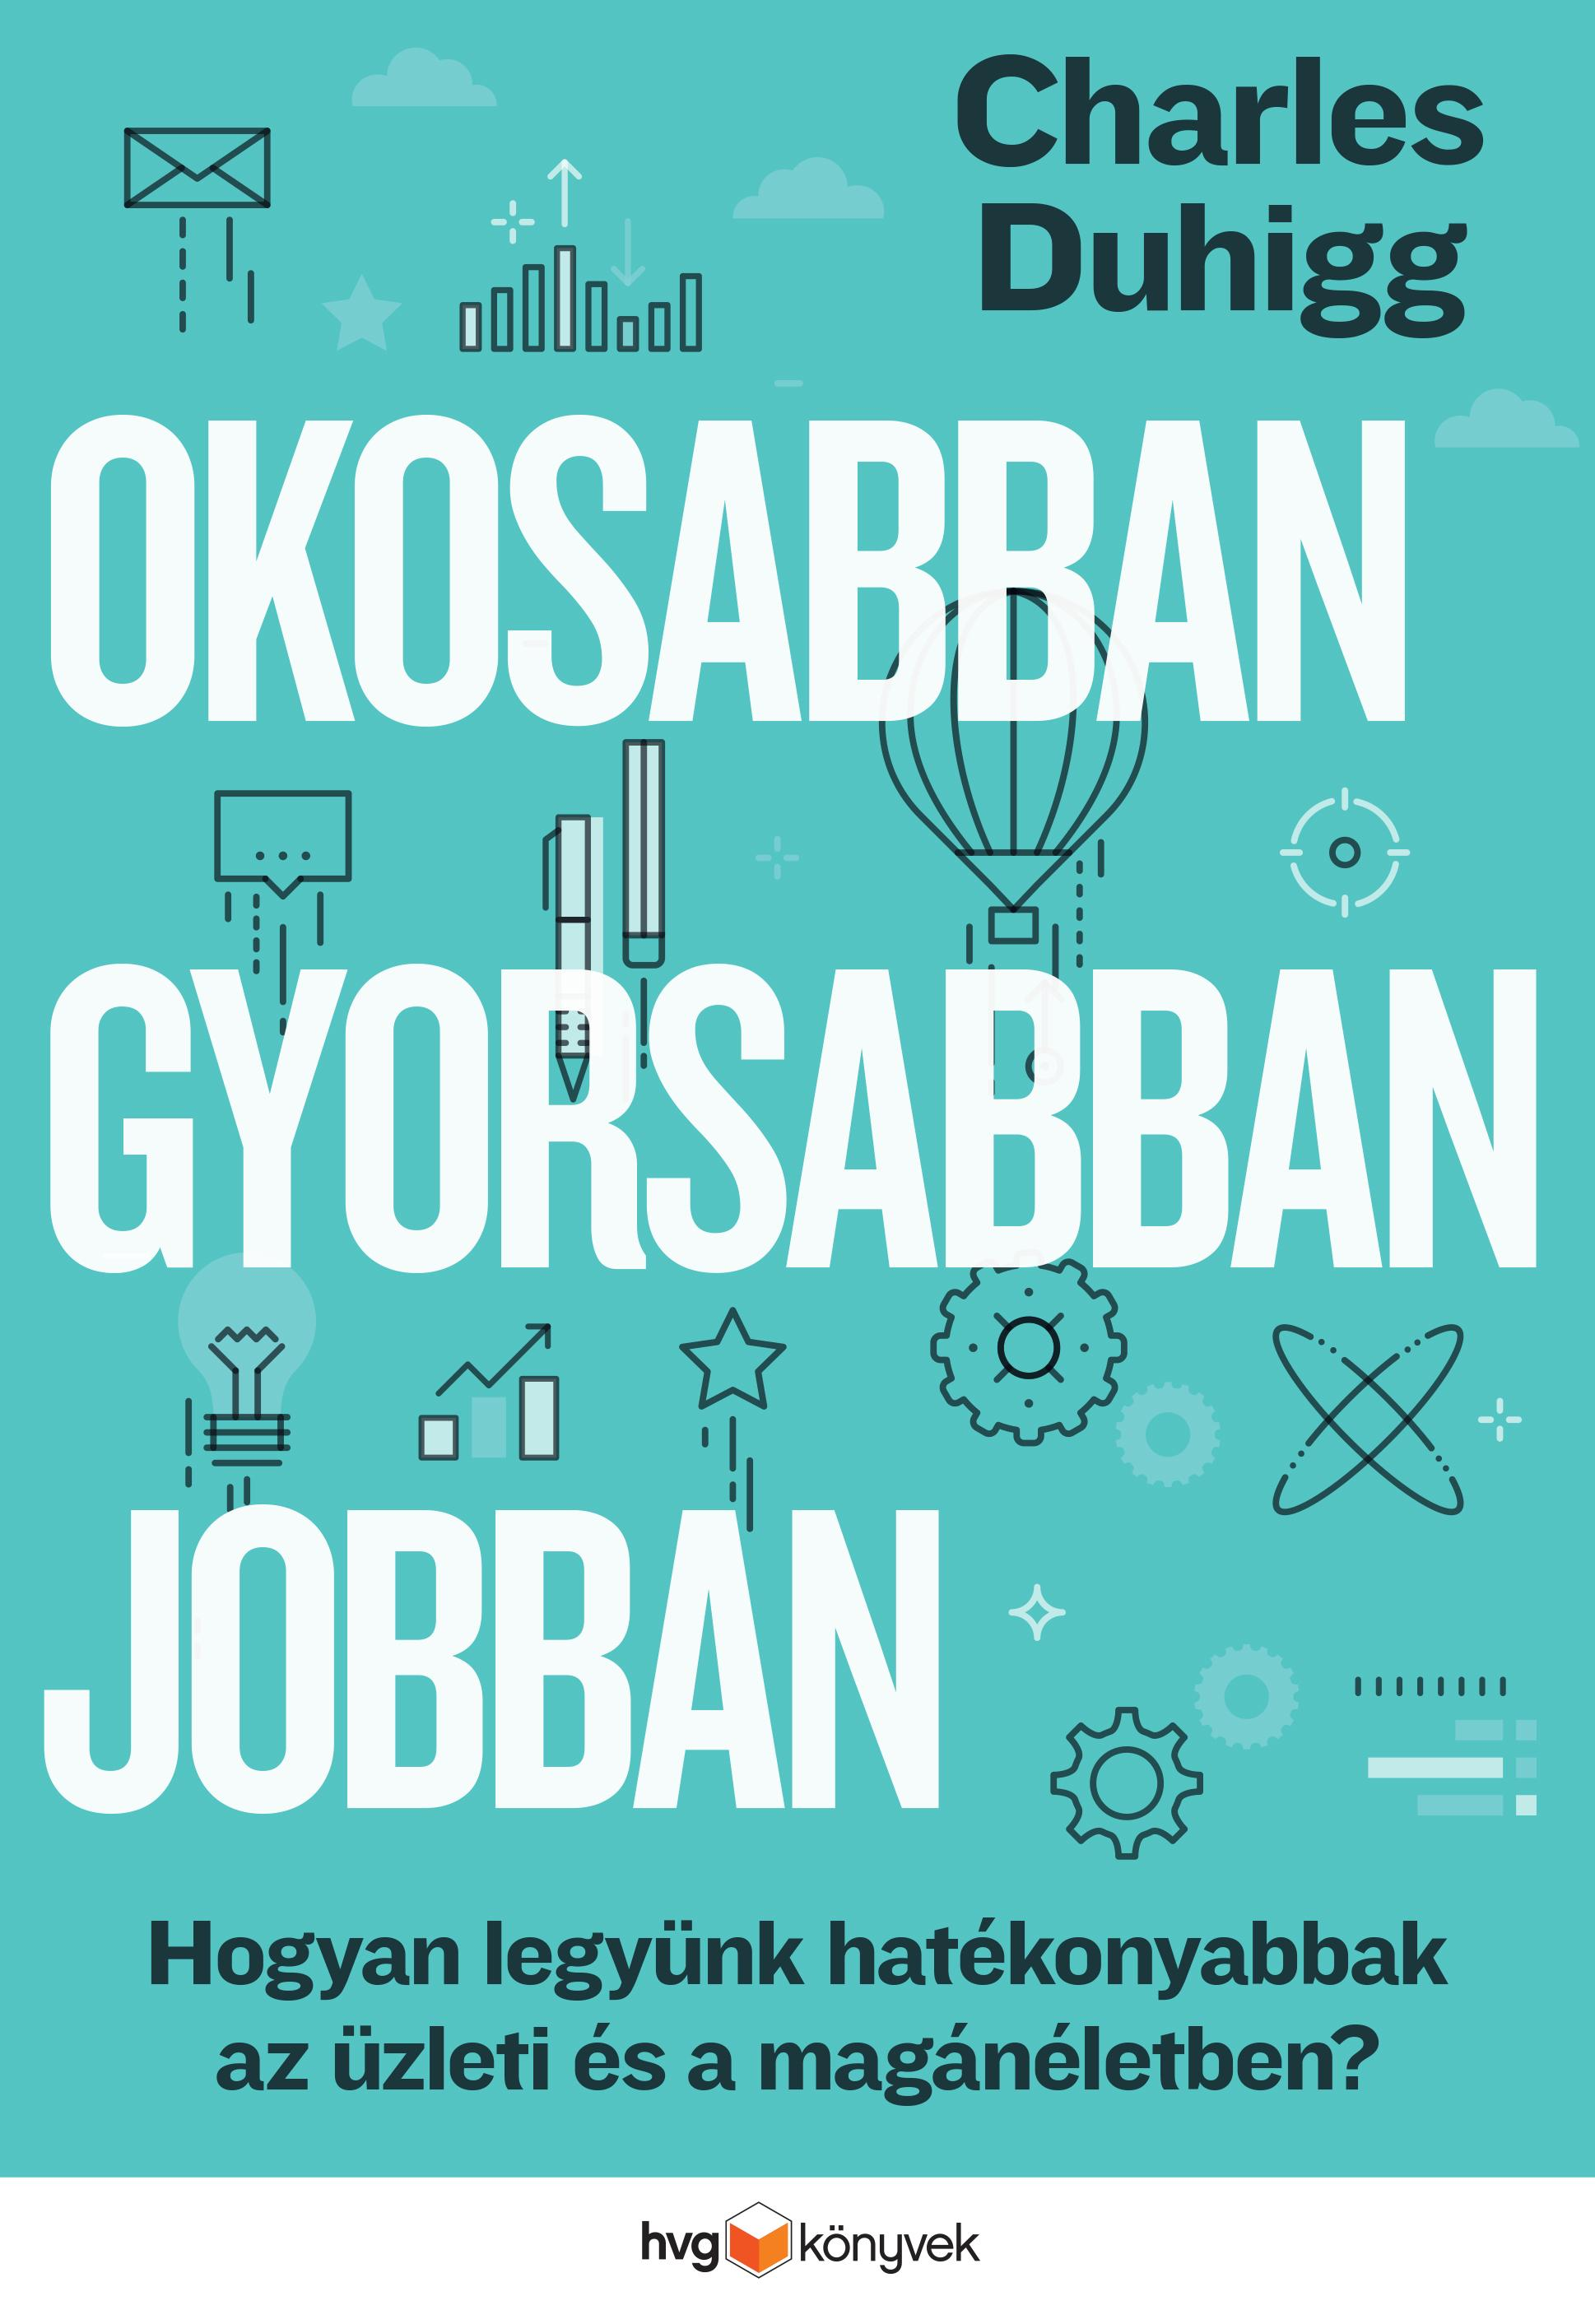 OKOSABBAN, GYORSABBAN, JOBBAN